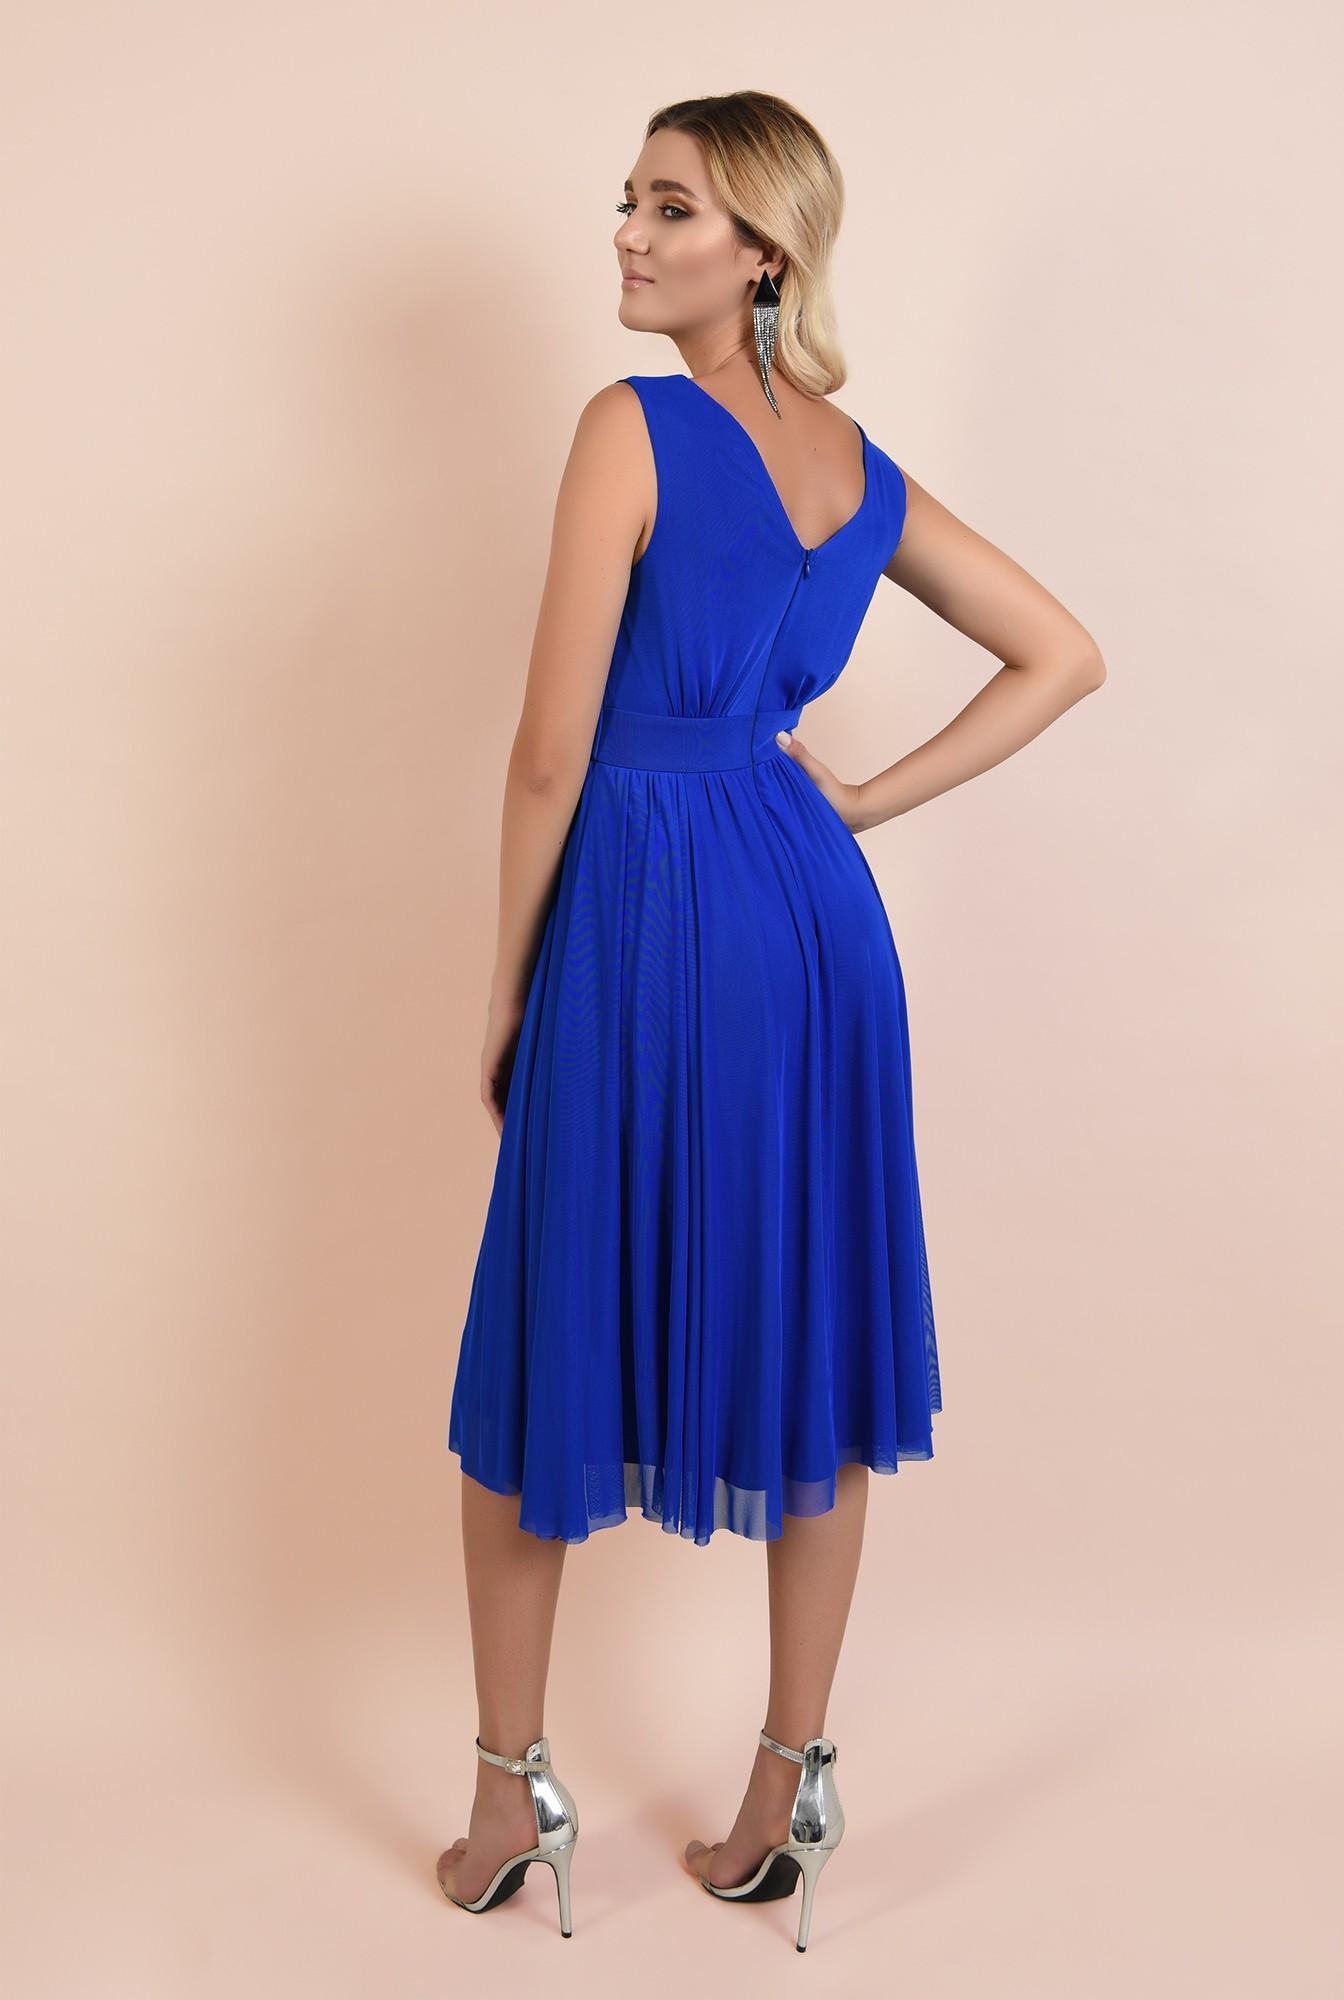 1 - rochie de seara, albastra, tul, decolteu petrecut, Poema, clos